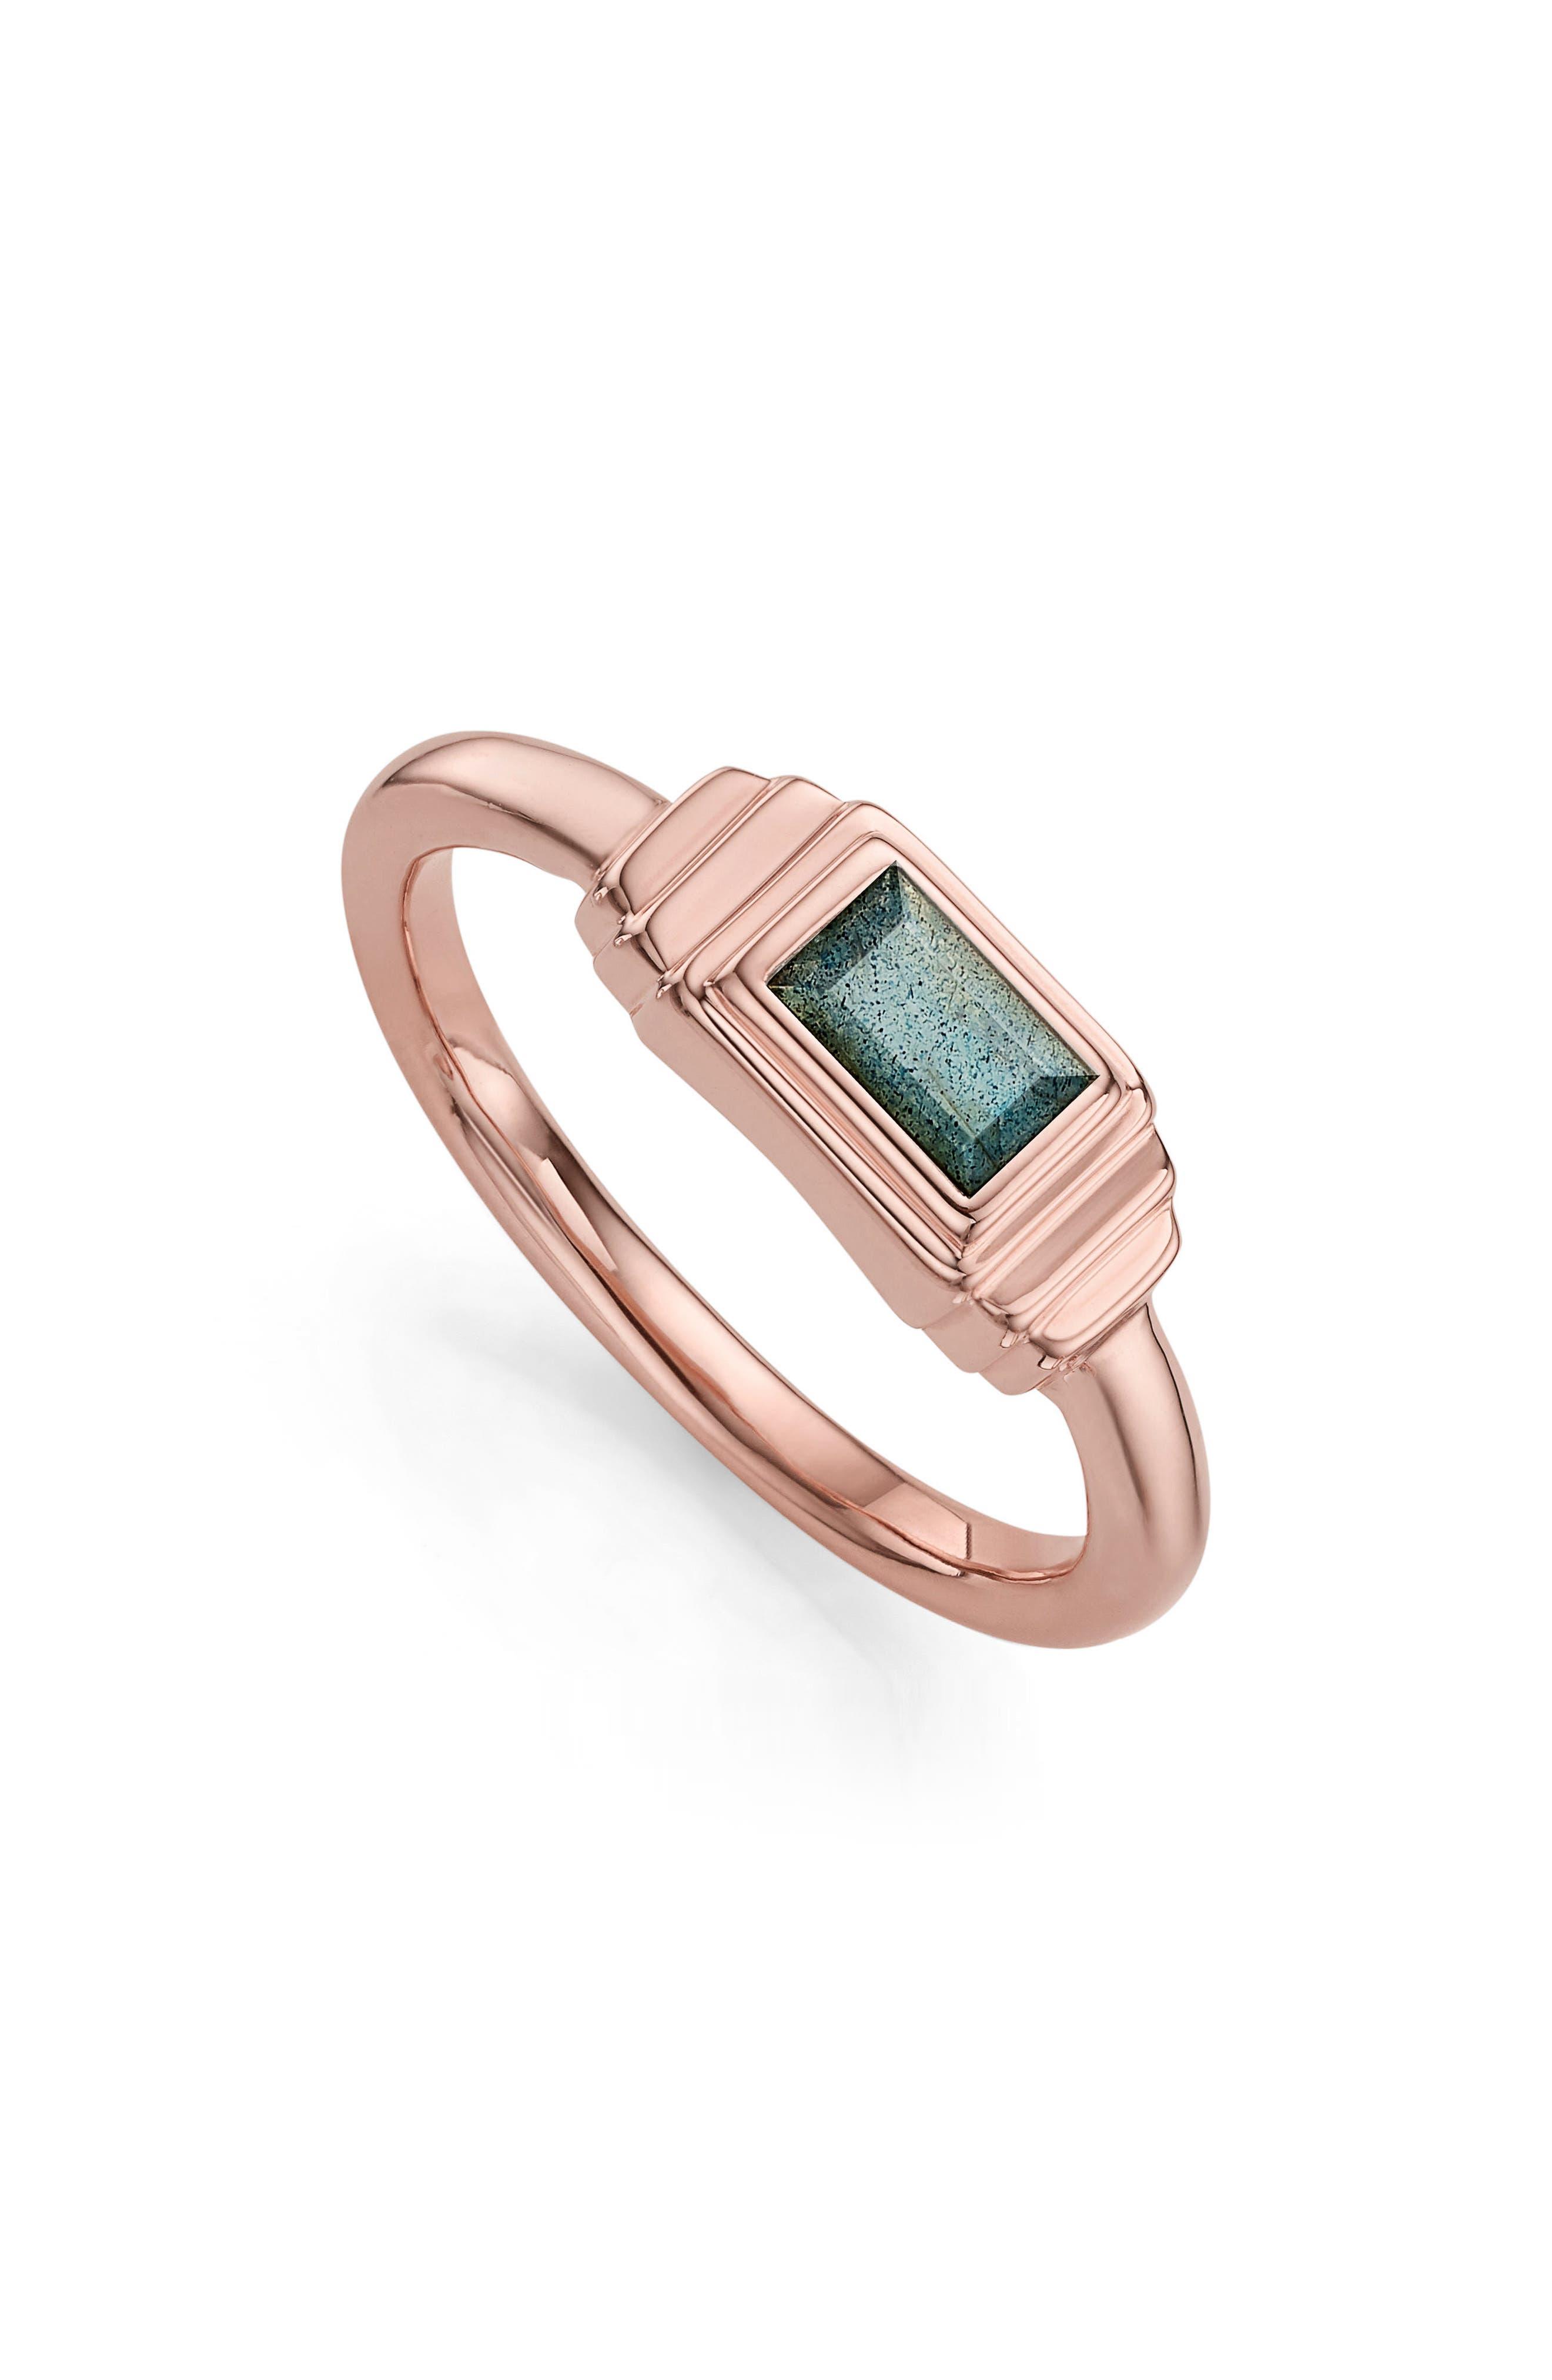 Monica Vinader Baja Deco Semiprecious Stone Ring